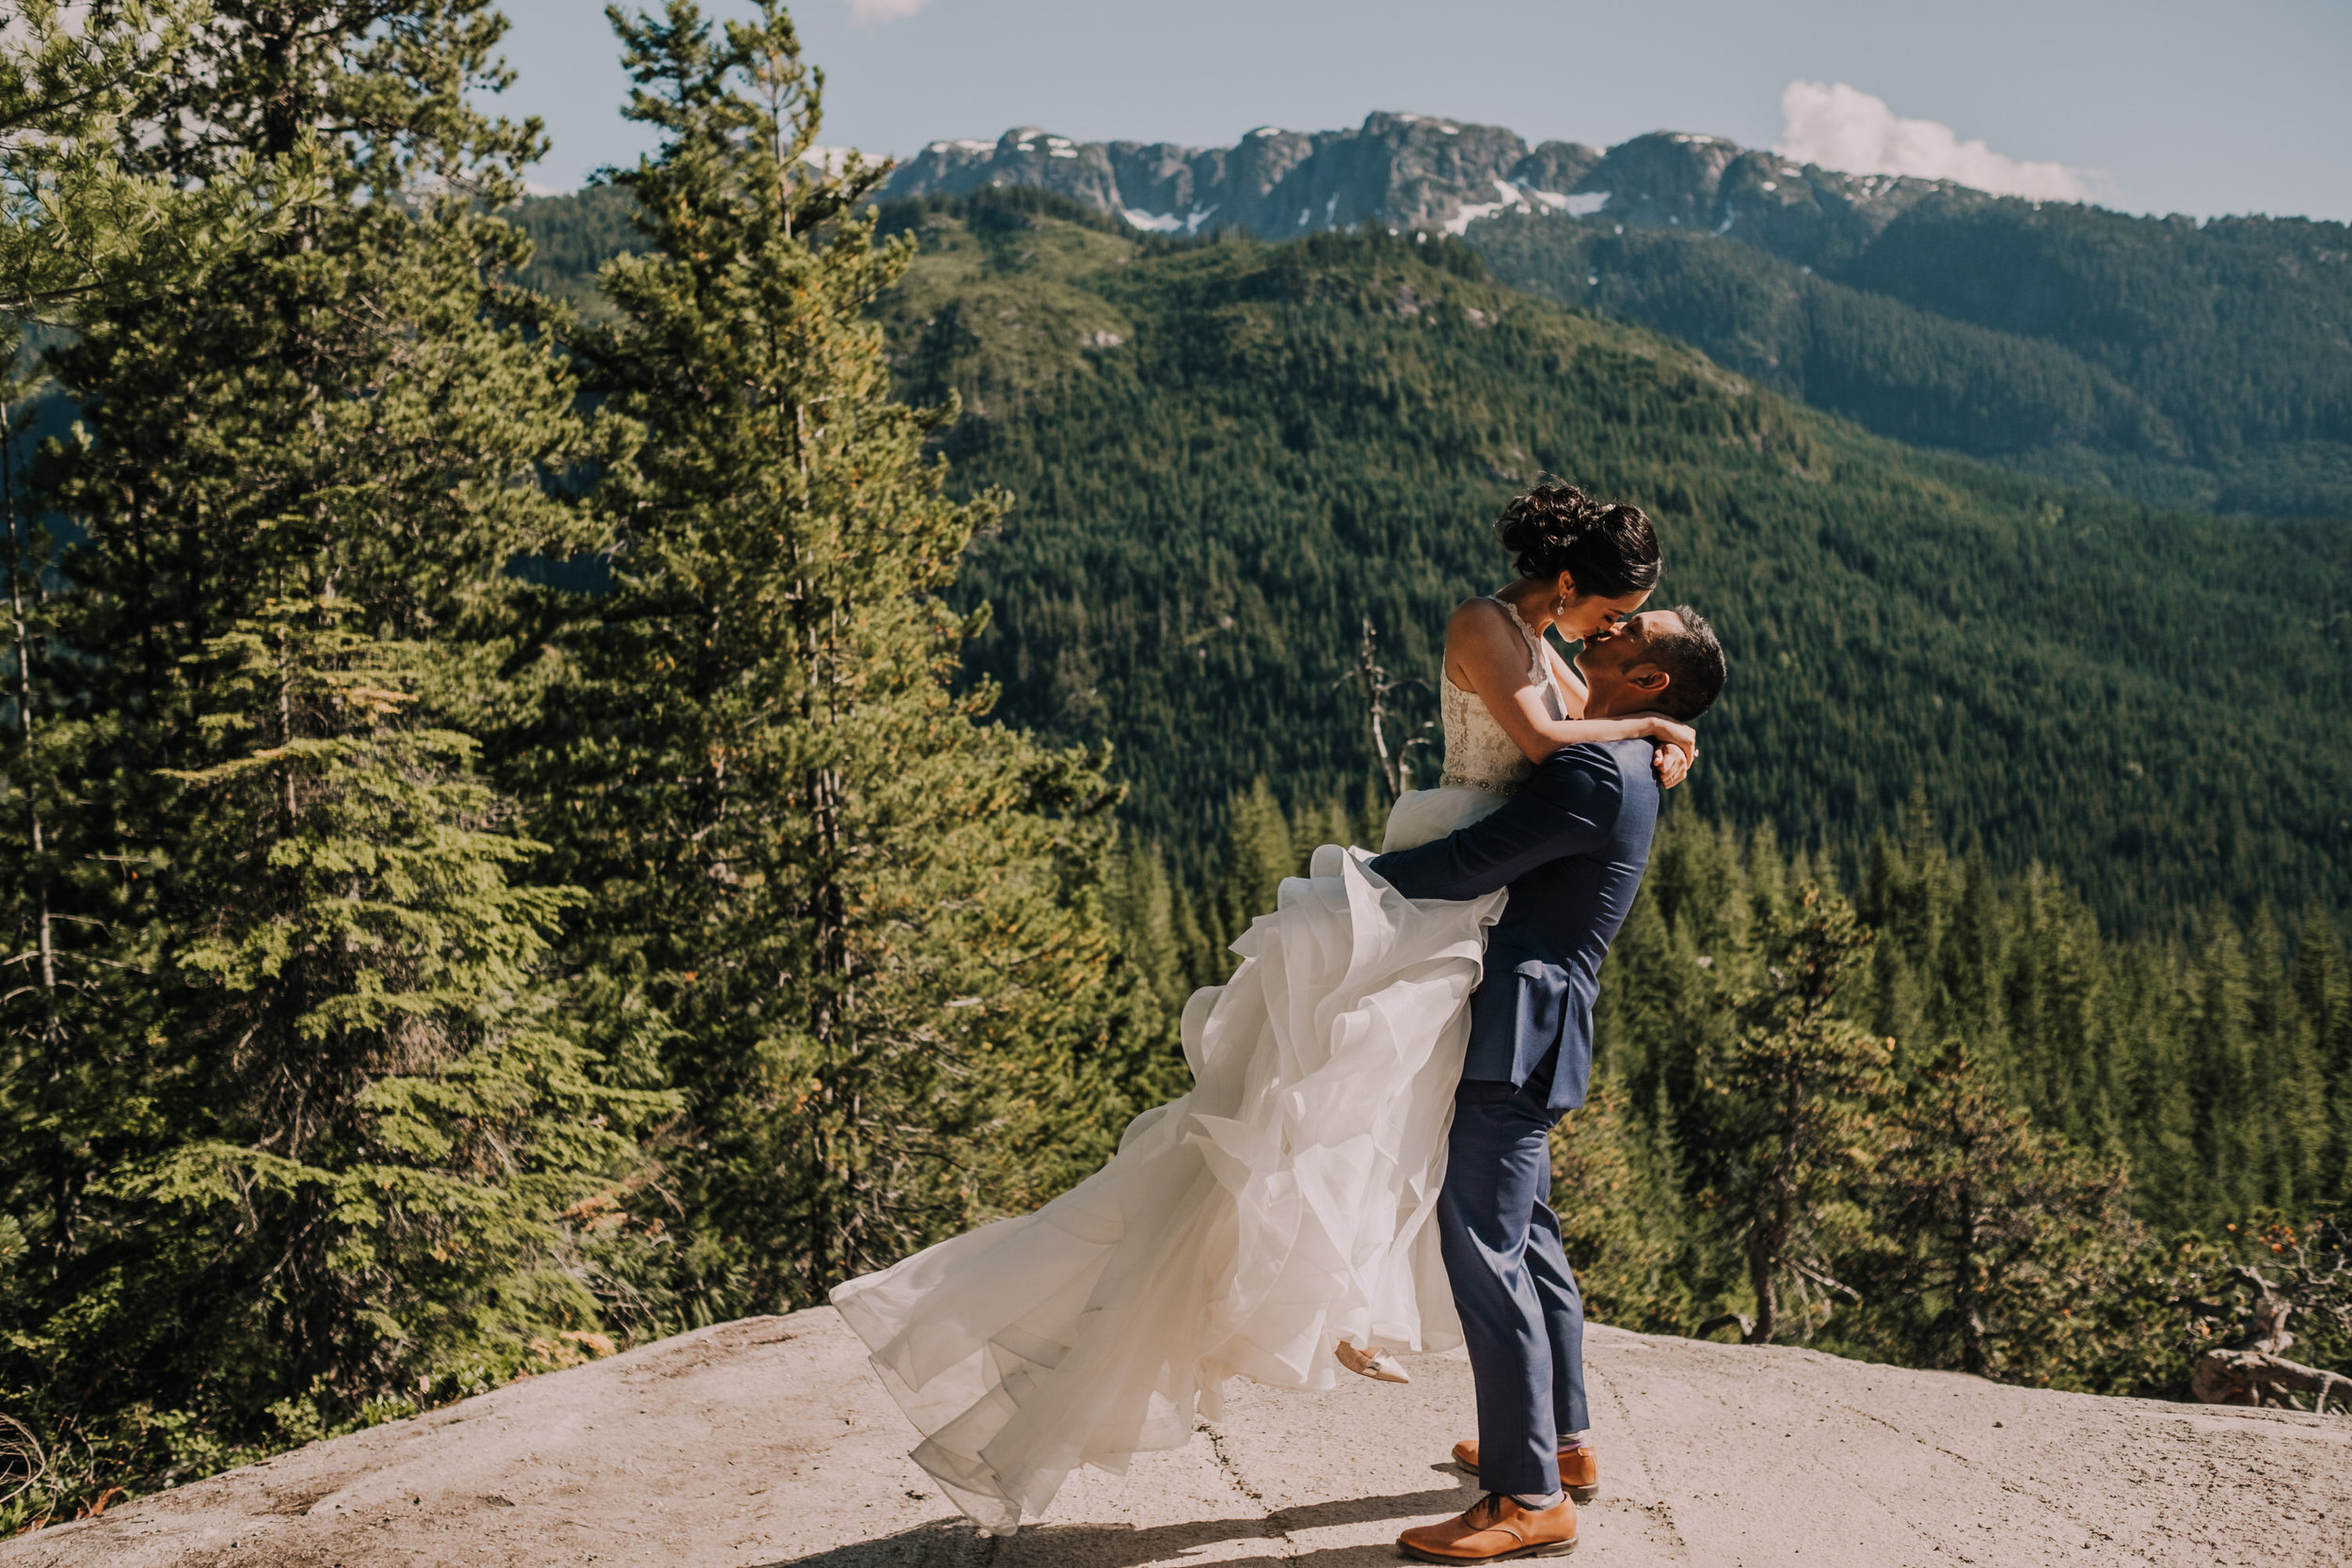 Squamish Wedding Photographer - Sea to Sky Gondola Wedding Photos -  Vancouver Wedding Photographer & Videographer - Sunshine Coast Wedding Photos - Sunshine Coast Wedding Photographer - Jennifer Picard Photography - DSCF7625.jpg